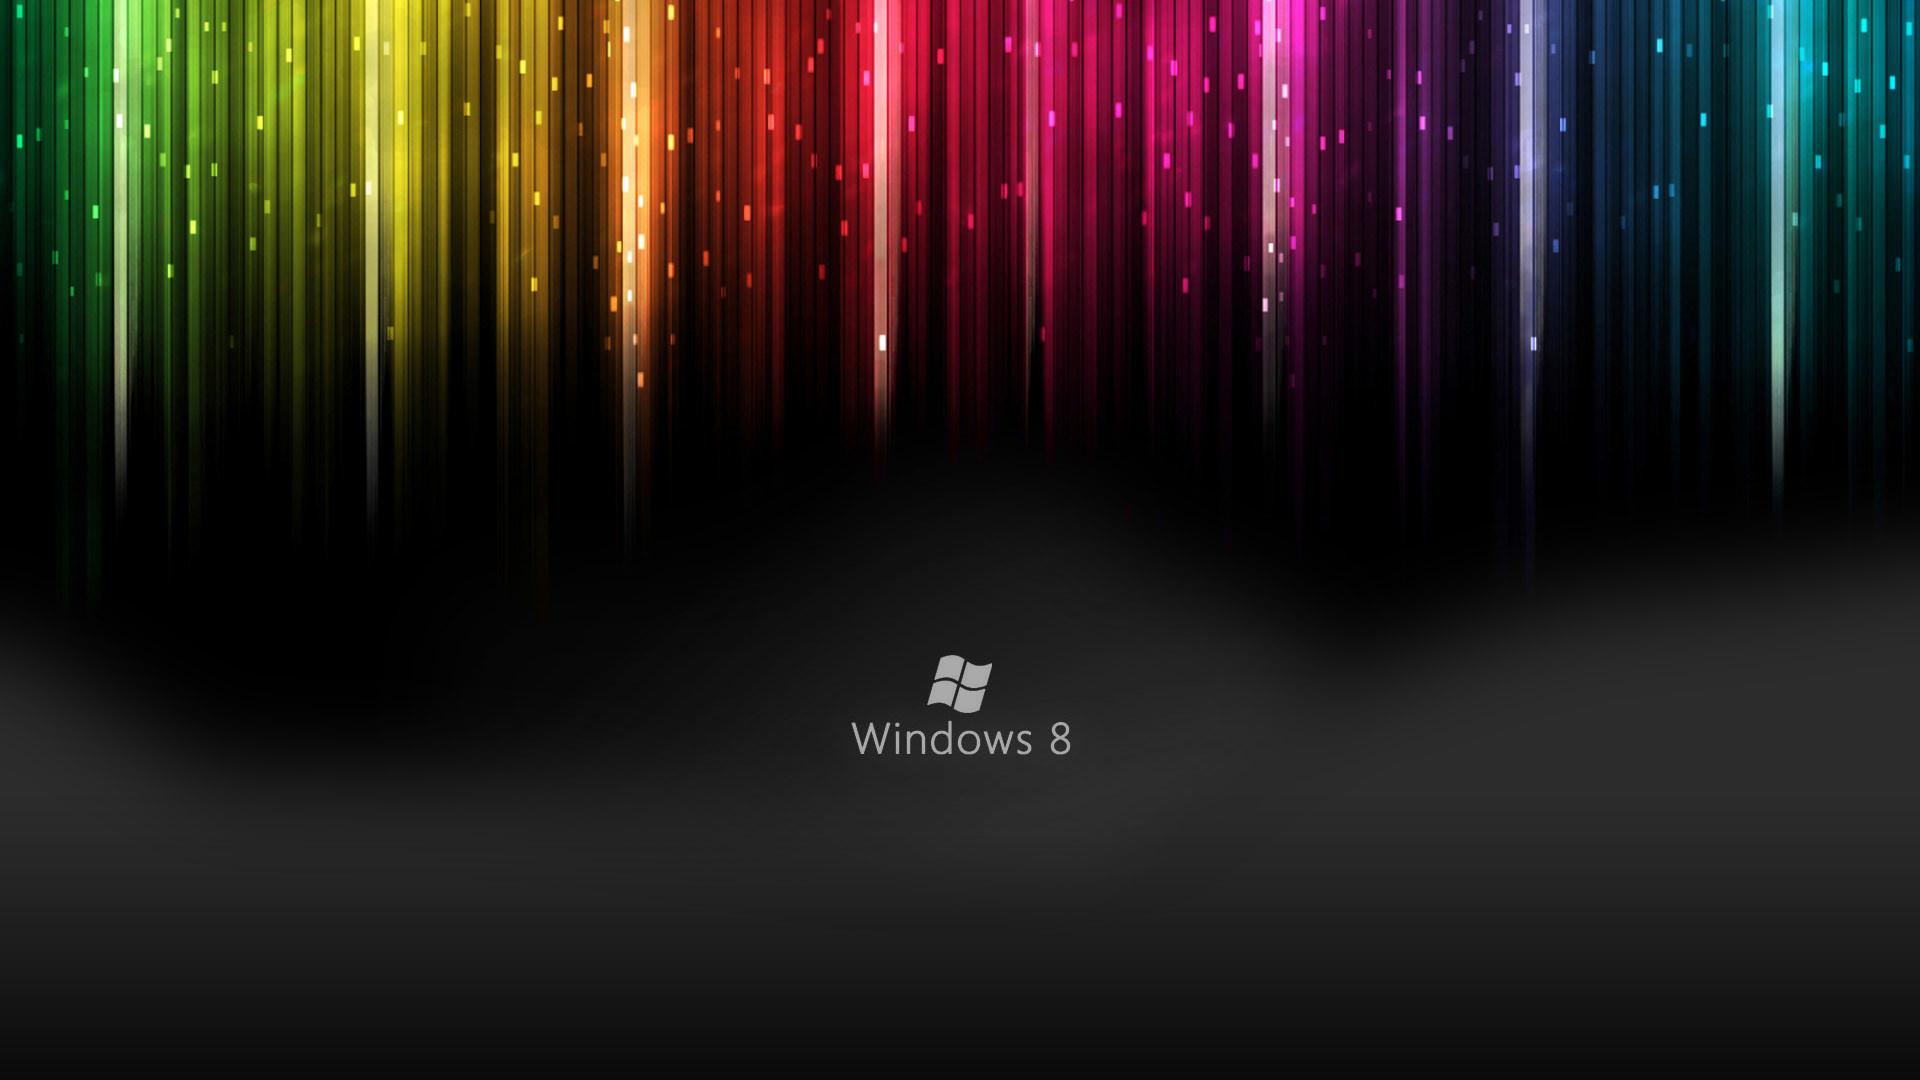 1920x1080 Windows 8 Live Wallpapers HD Wallpaper Of